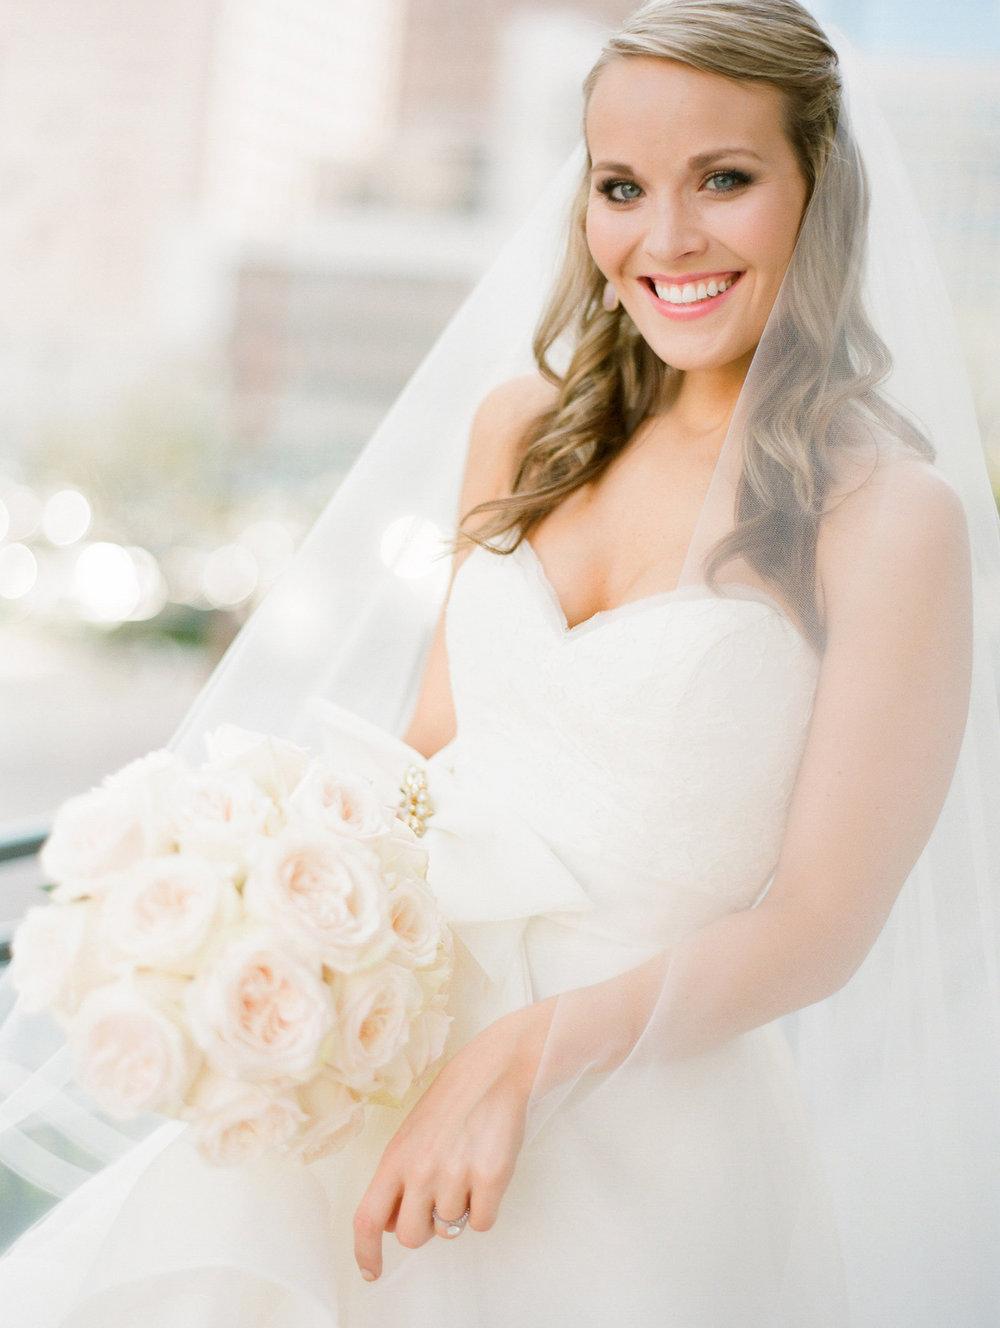 0008_0008_Houston-Rice-Crystal-Ballroom-Film-Bridal-Photographer.jpg